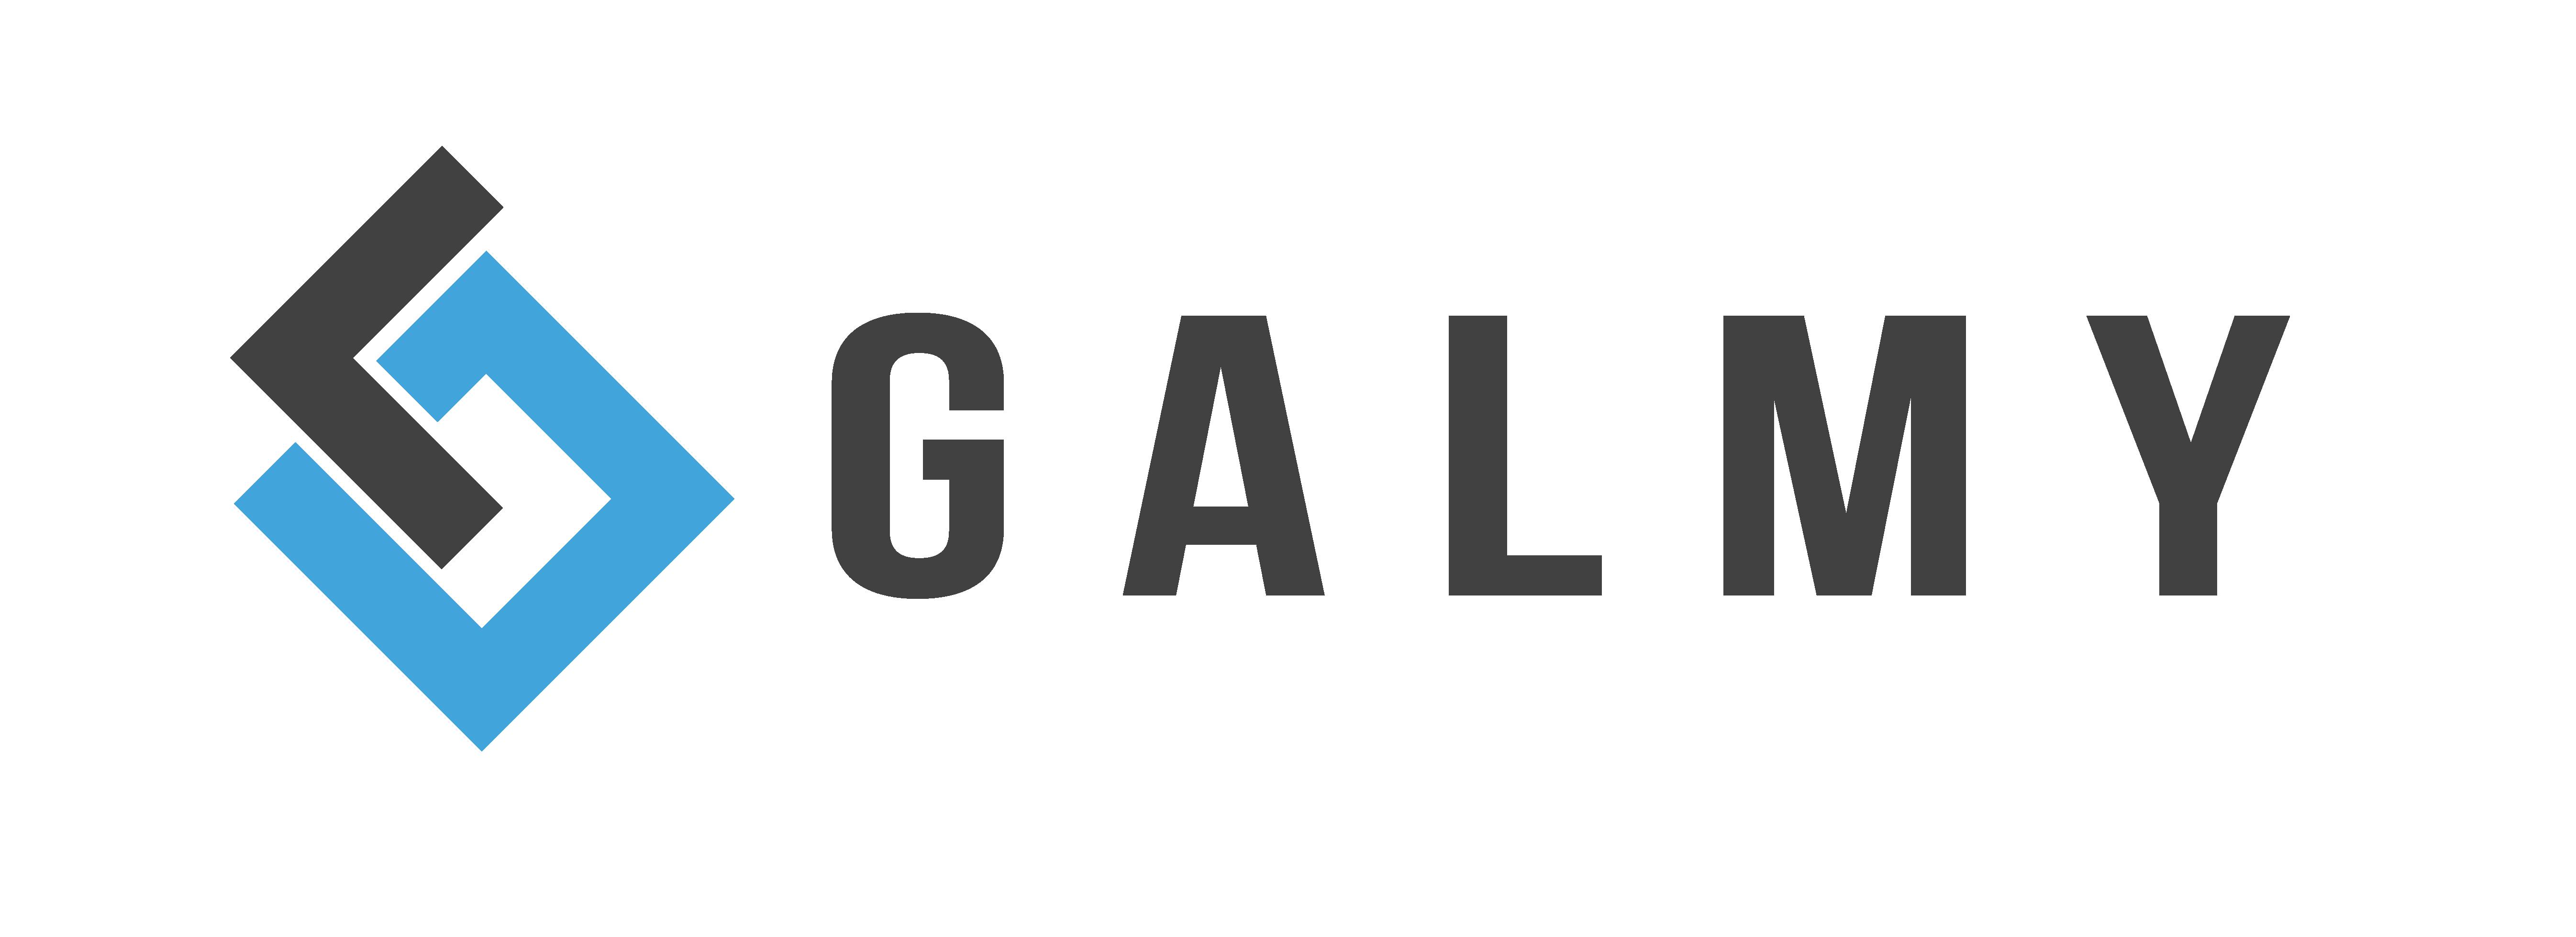 Galmy Global Logo Grey and Blue